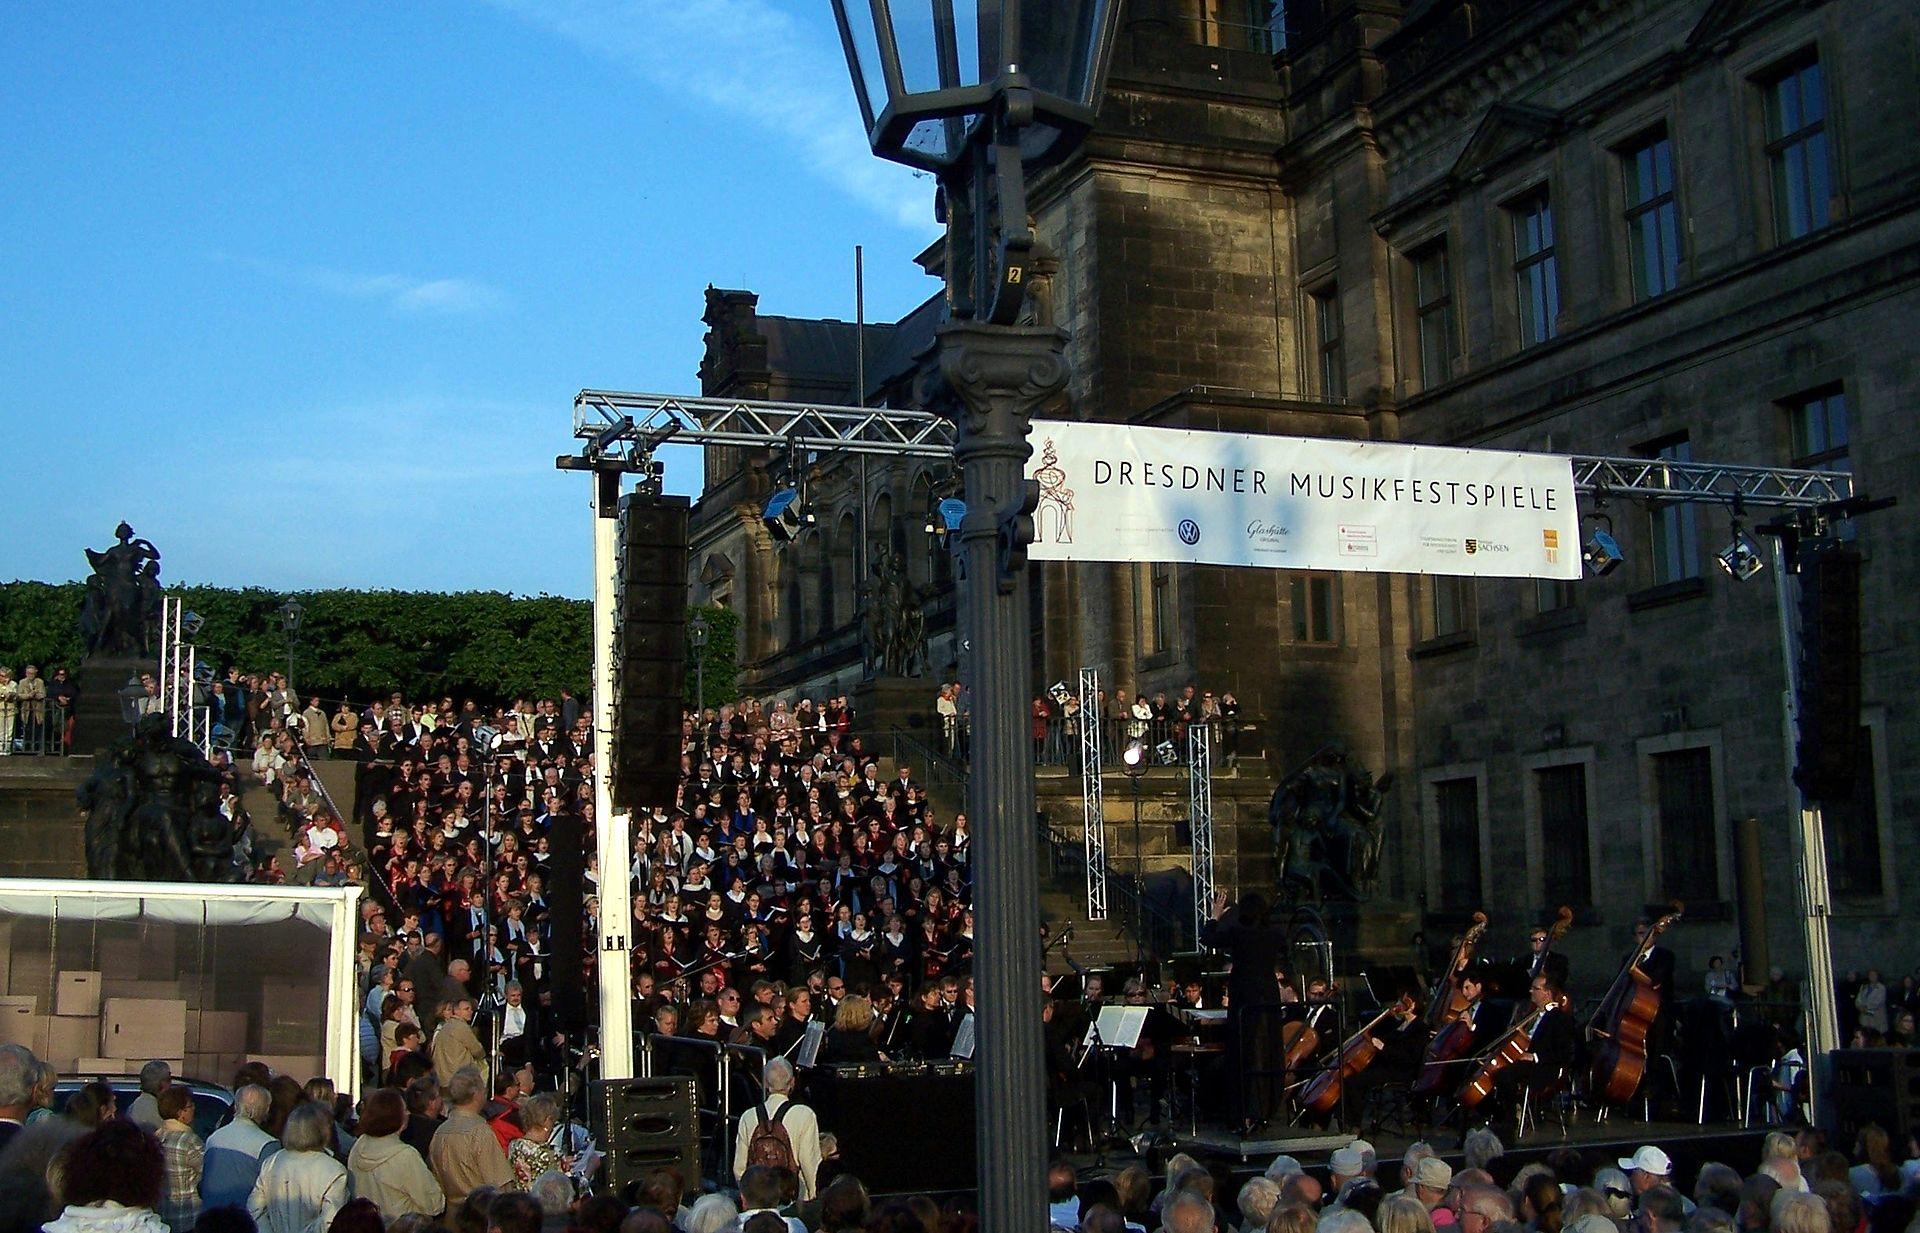 Bild Dresdner Musikfestspiele